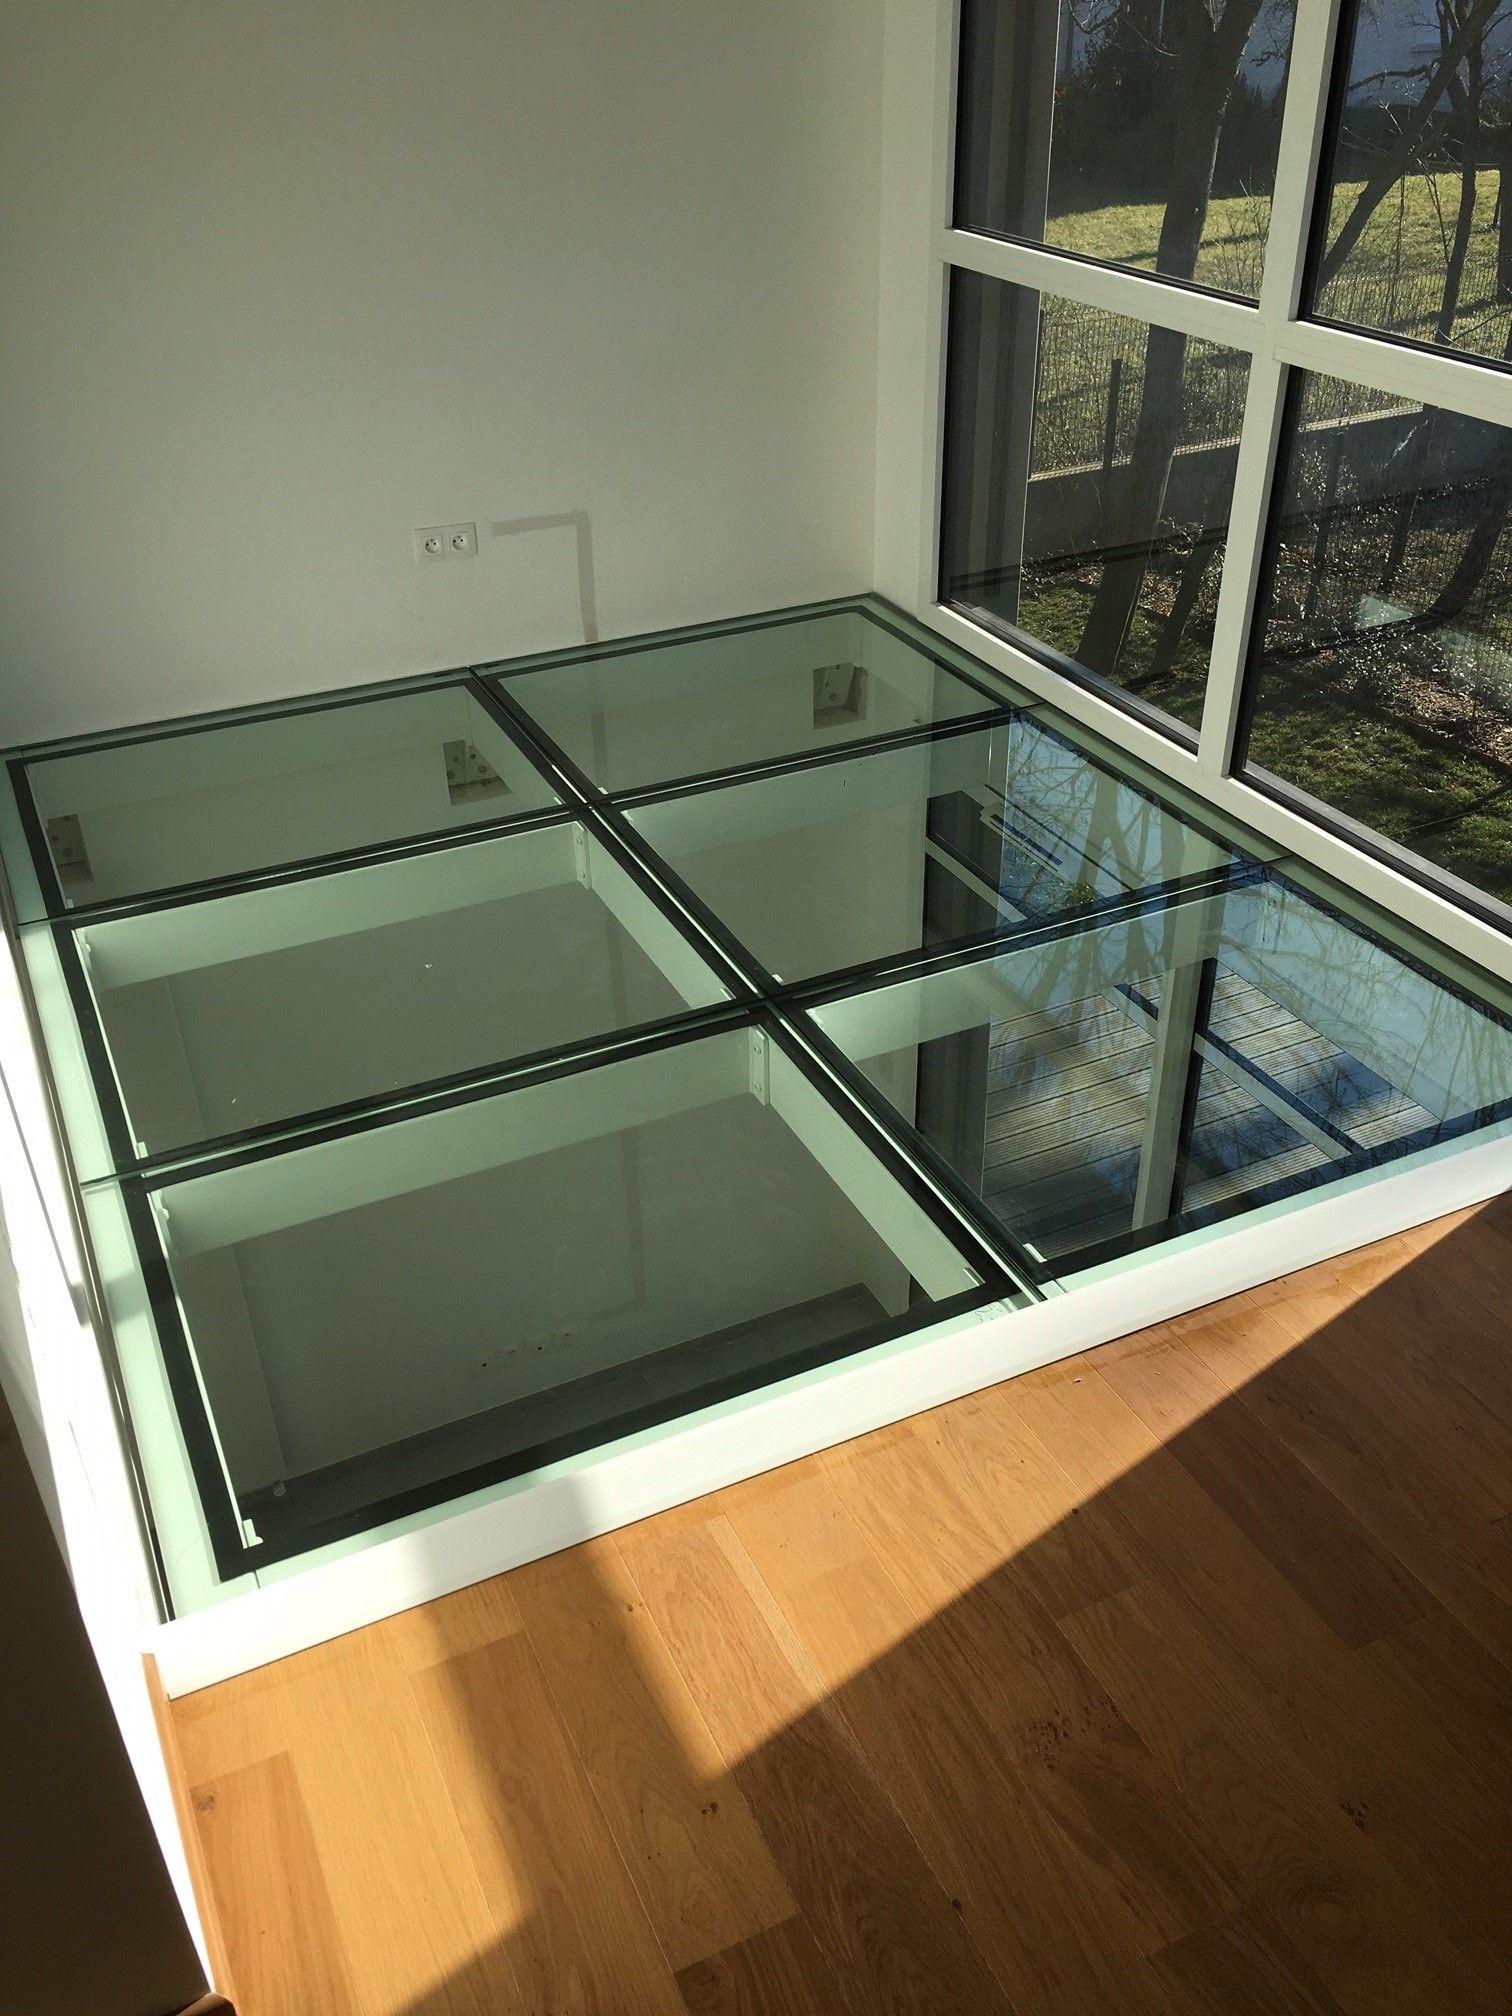 Etude fabrication et installation d une plateforme mezzanine